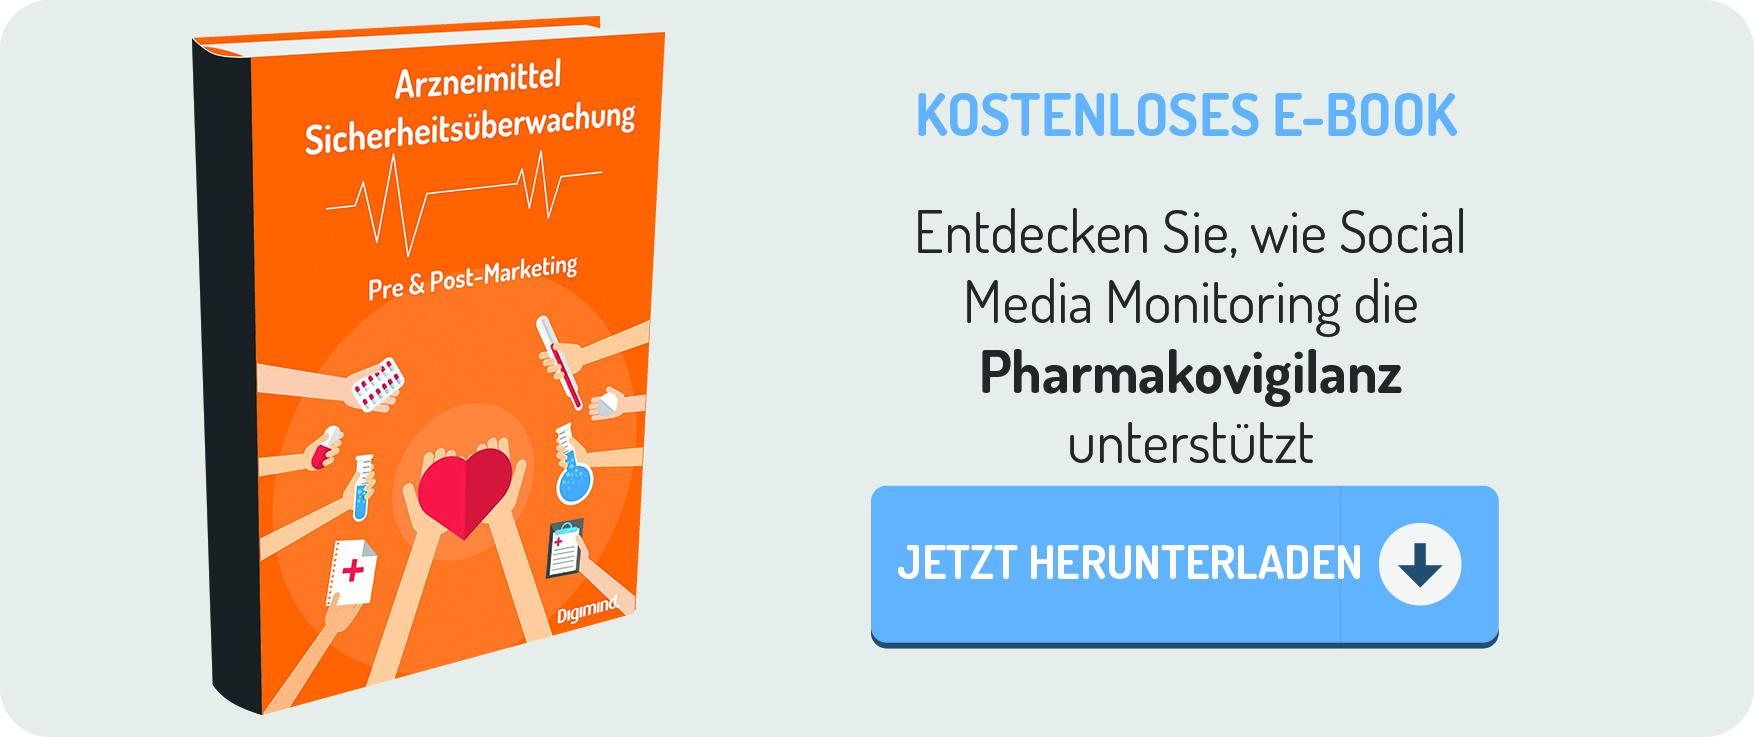 E-Book 'Pharmakovigilanz' herunterladen